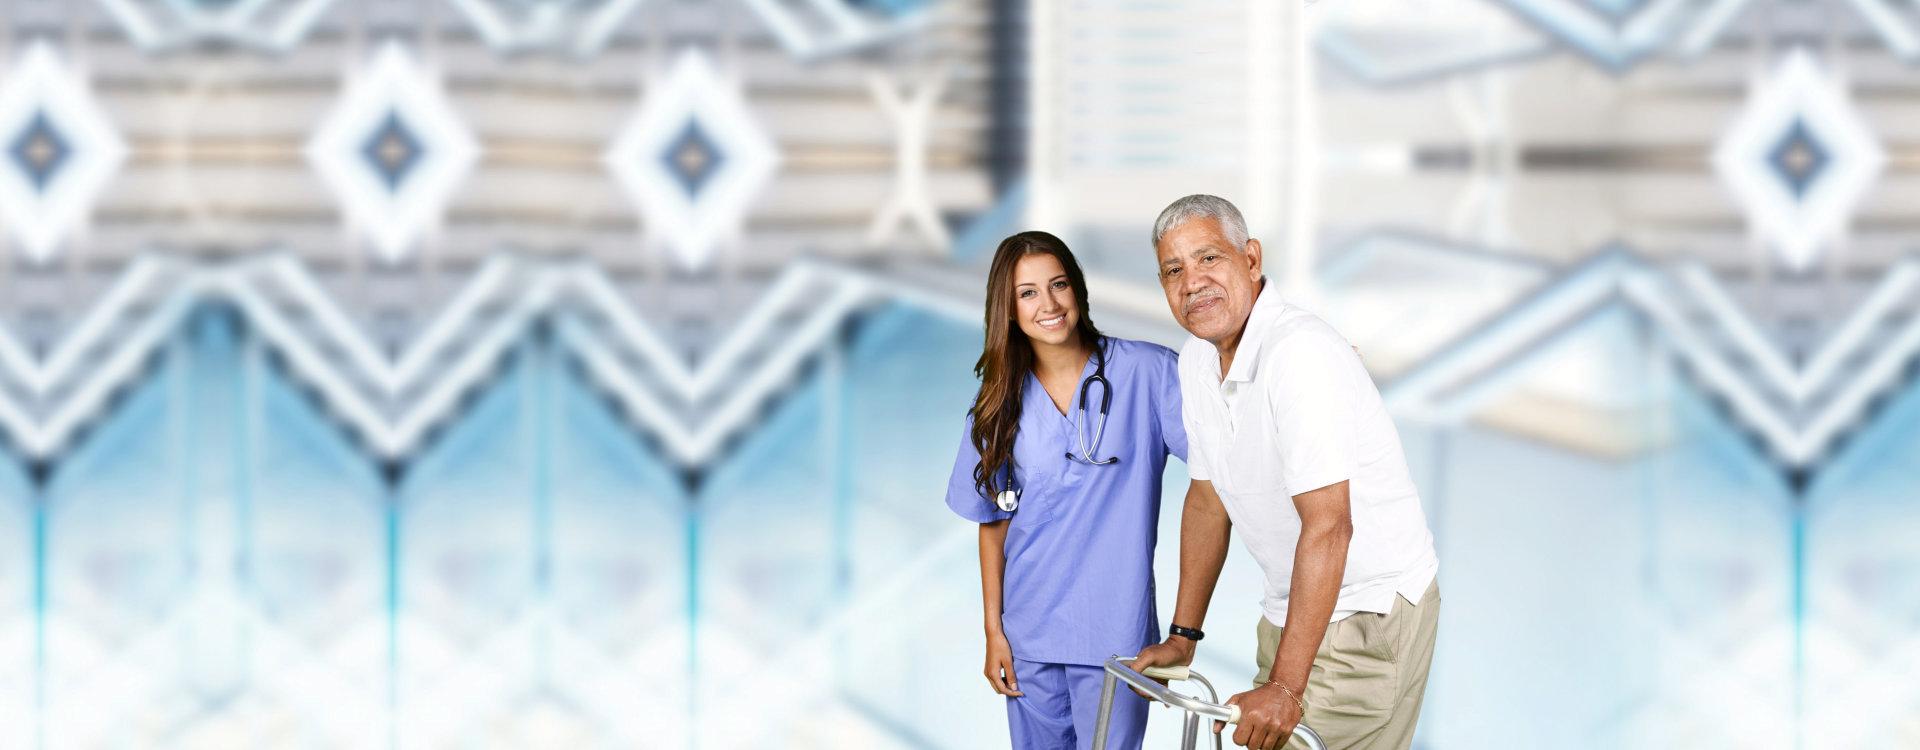 caregiver assisting elder man in walking